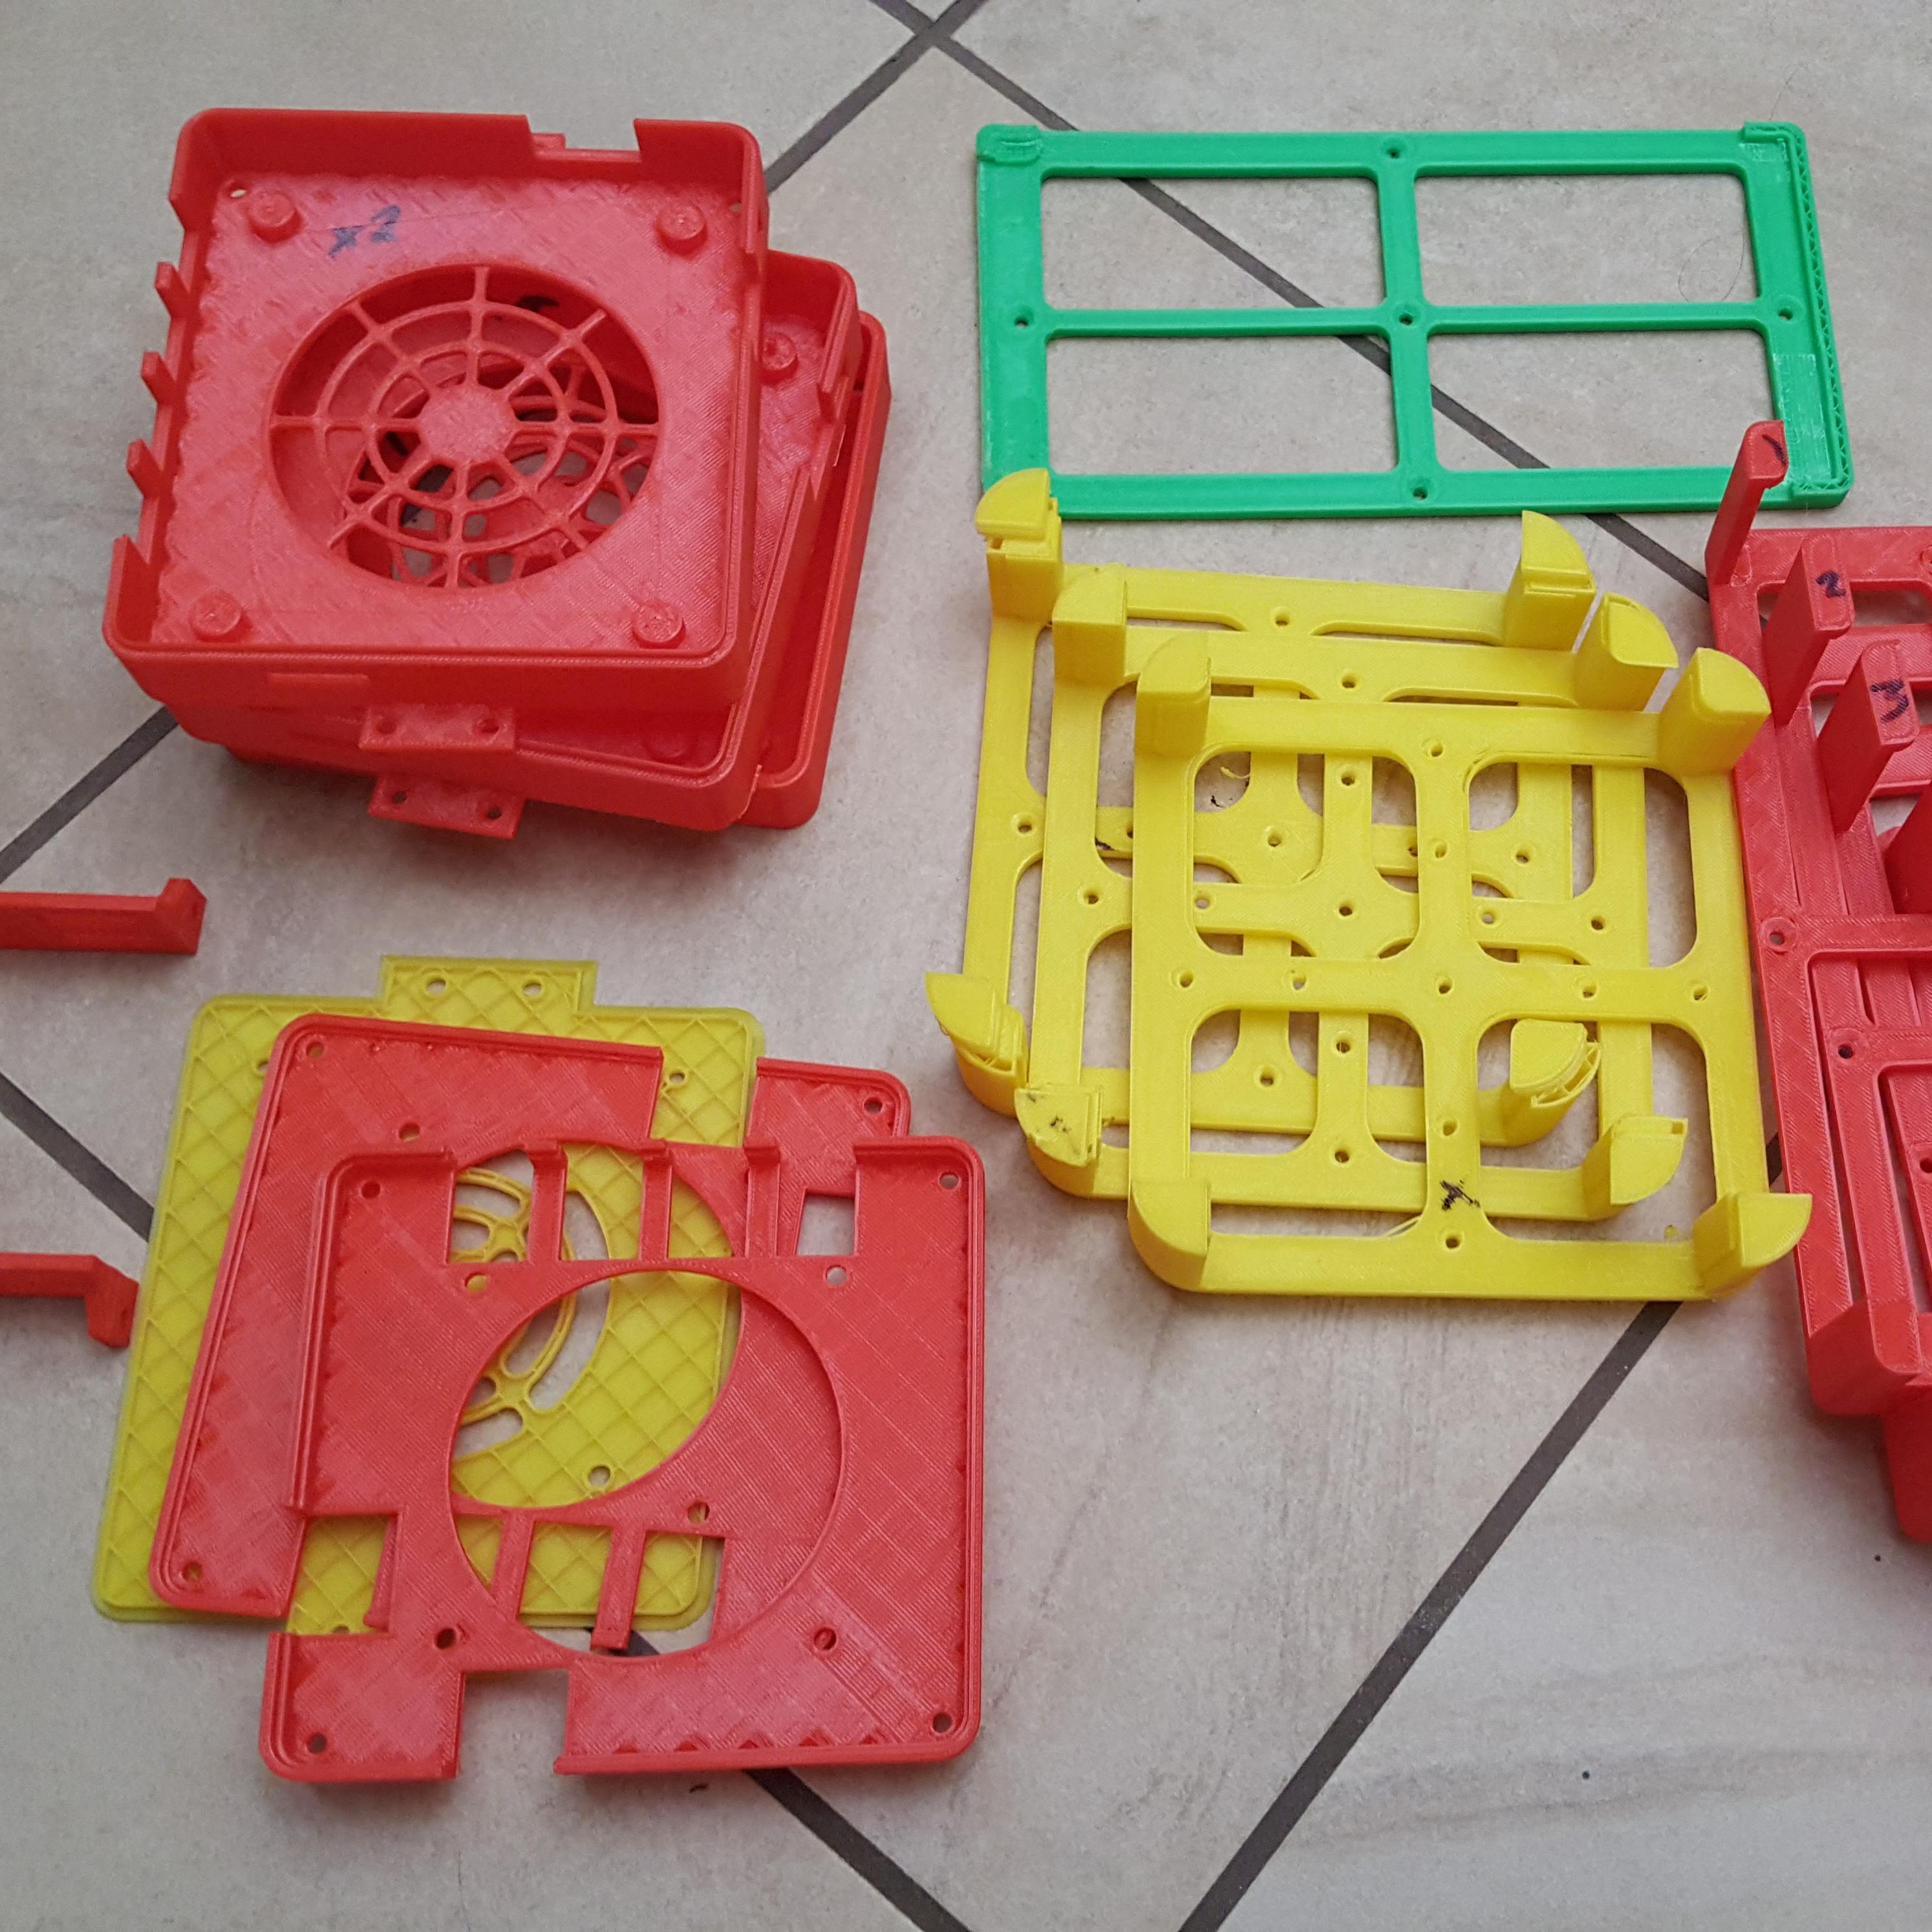 3D Modeling & Printing